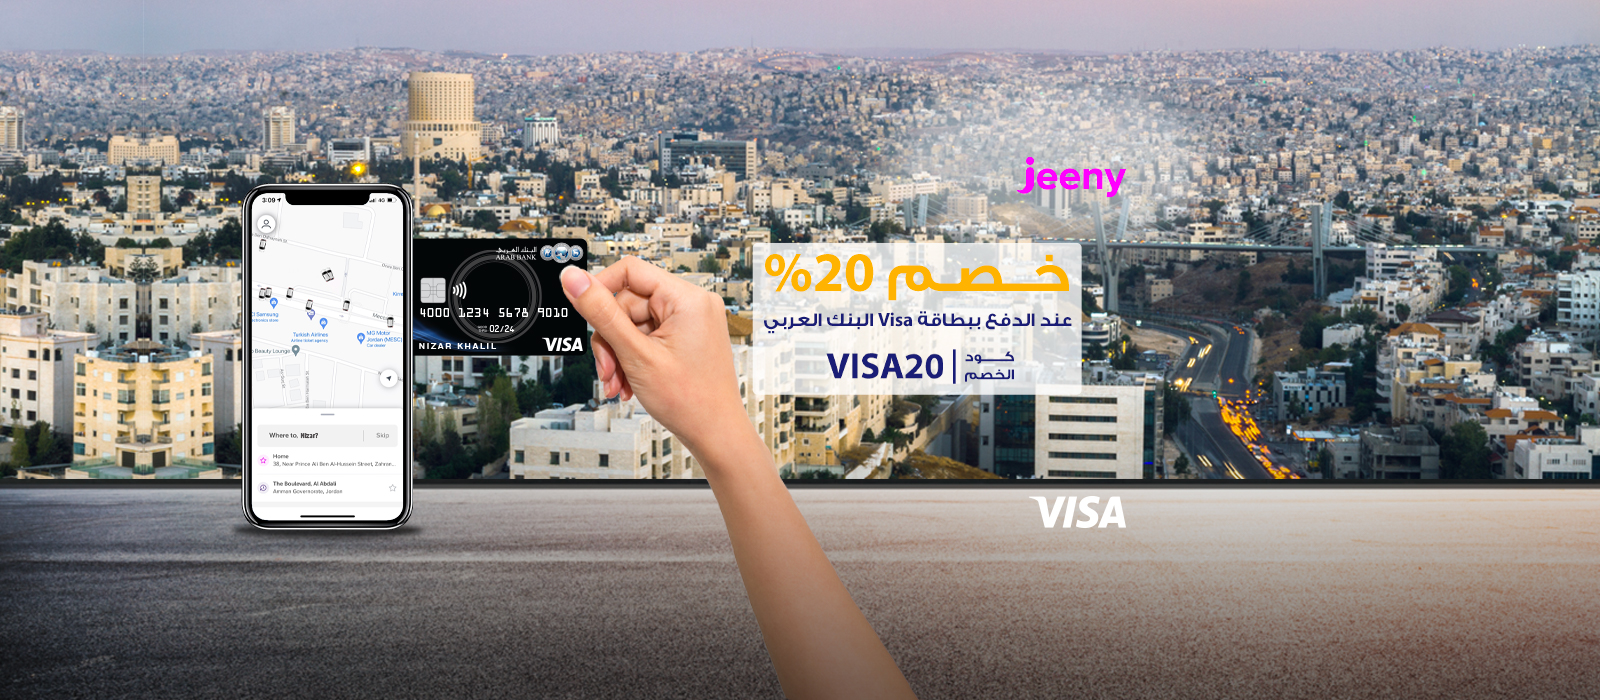 Jeeny web  Banner Arabic